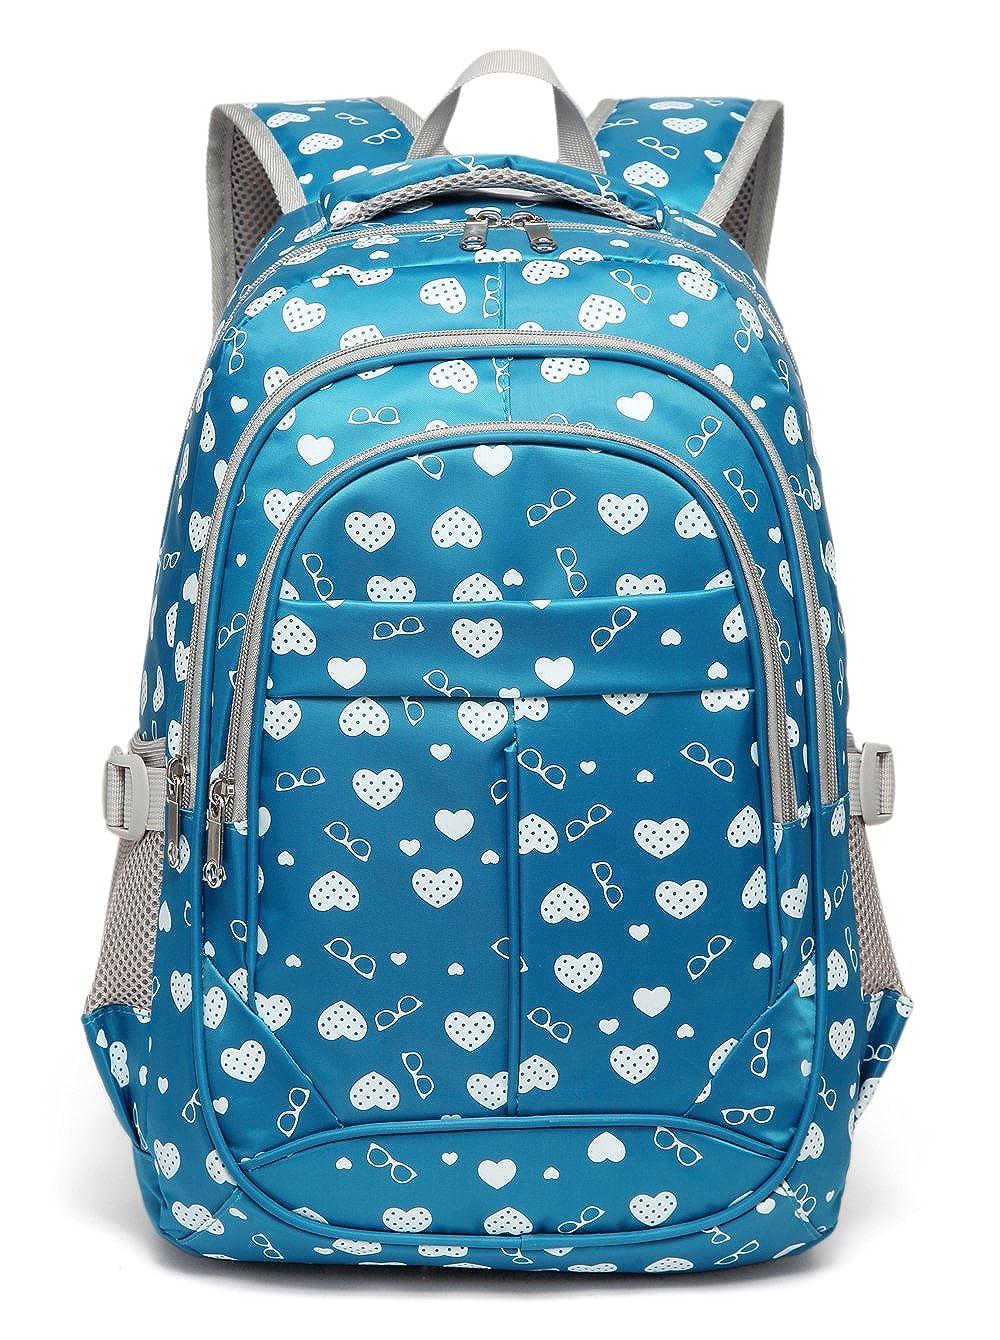 Sports Direct School Bags Uk   ReGreen Springfield b51af69a7c